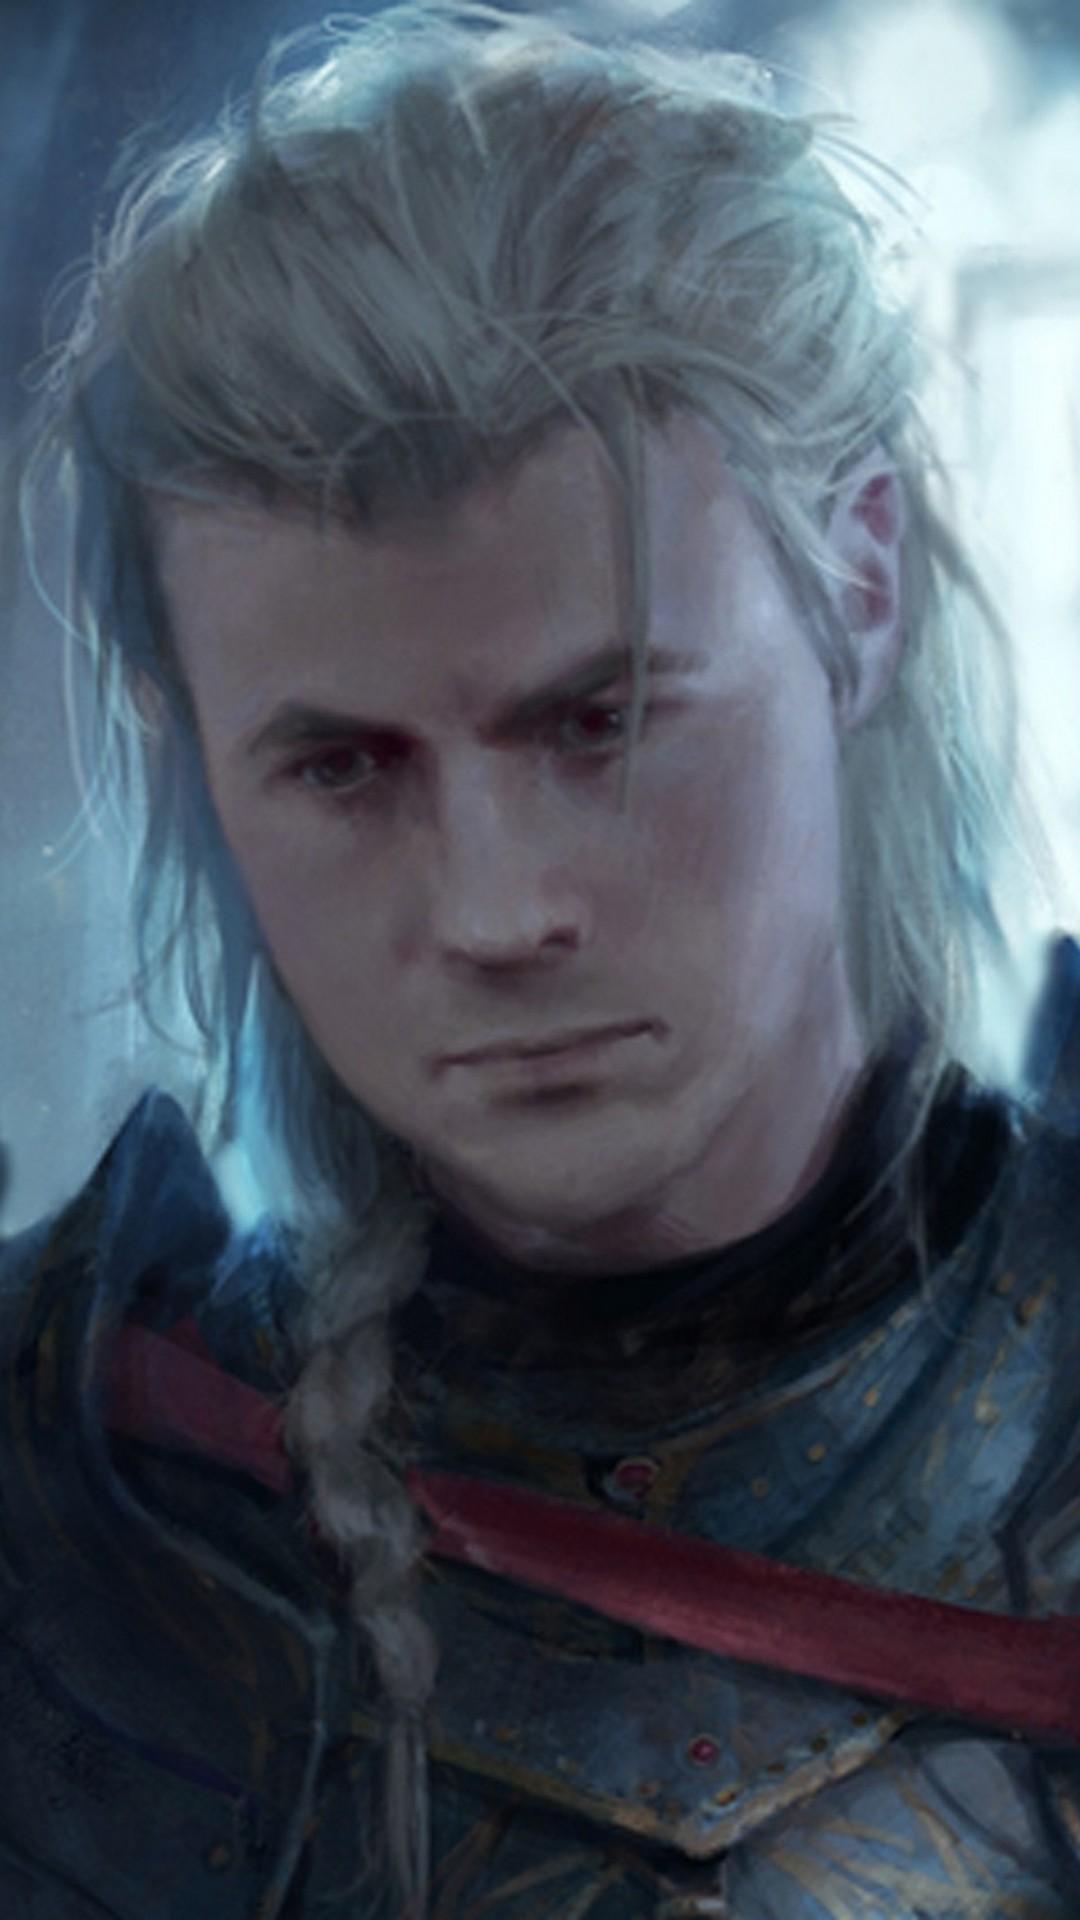 Rhaegar Targaryen Game Of Thrones Iphone Wallpaper - Rhaegar Targaryen Season 7 - HD Wallpaper